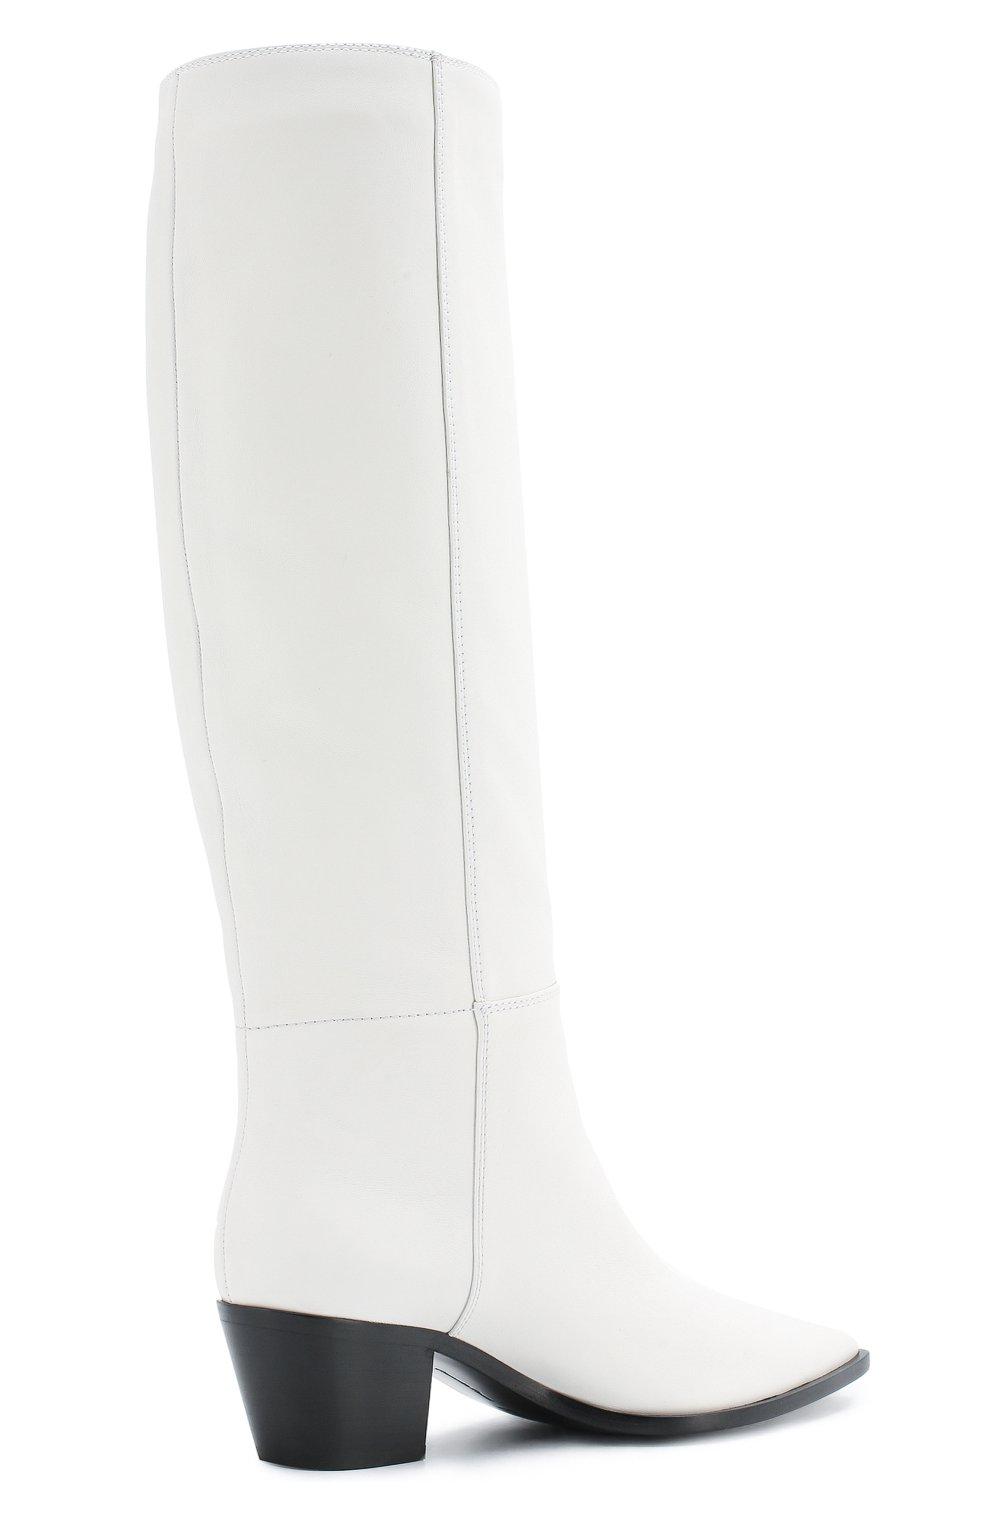 Кожаные сапоги Daenerys Gianvito Rossi белые | Фото №4